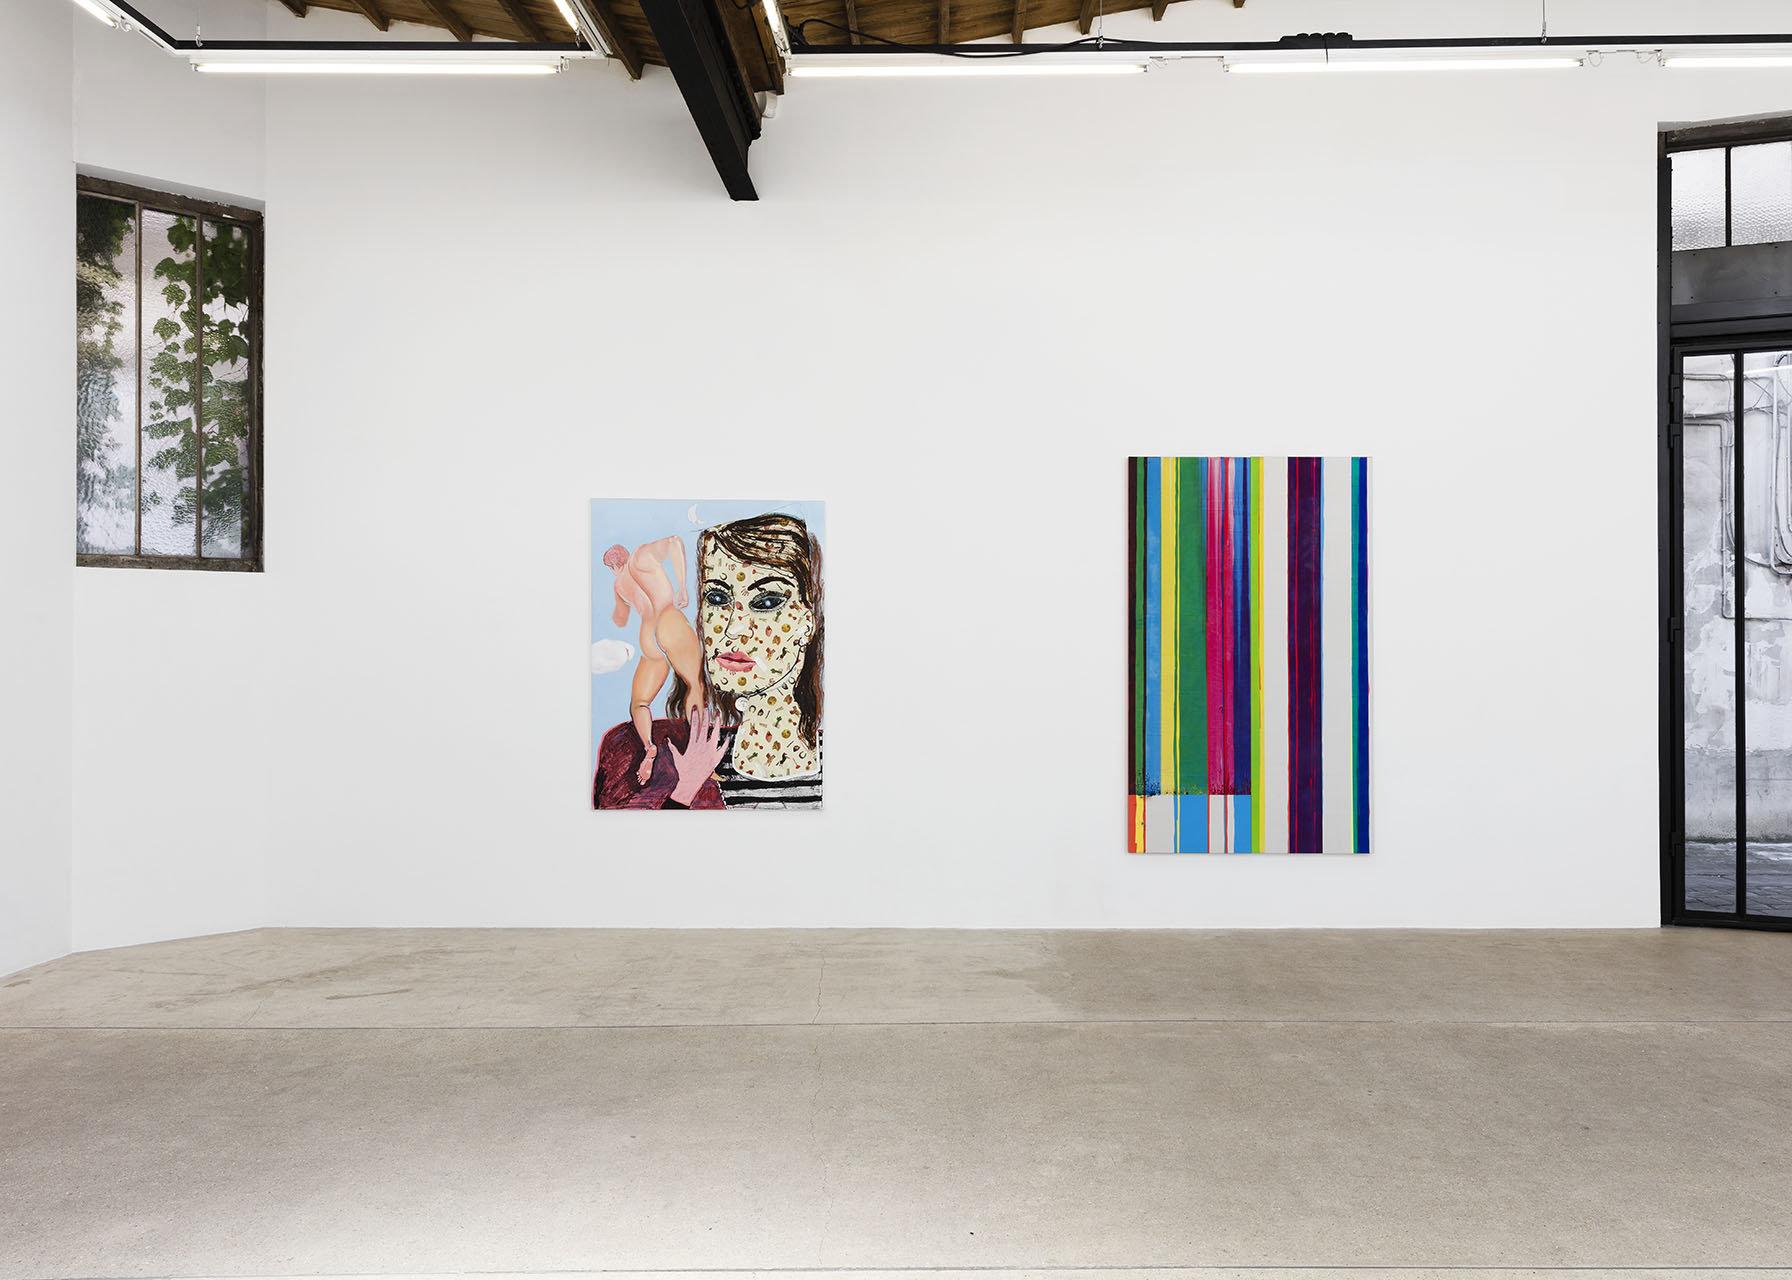 Galerie Frank Elbaz Leo Chesneau - Madeleine Roger-Lacan 1 NEW